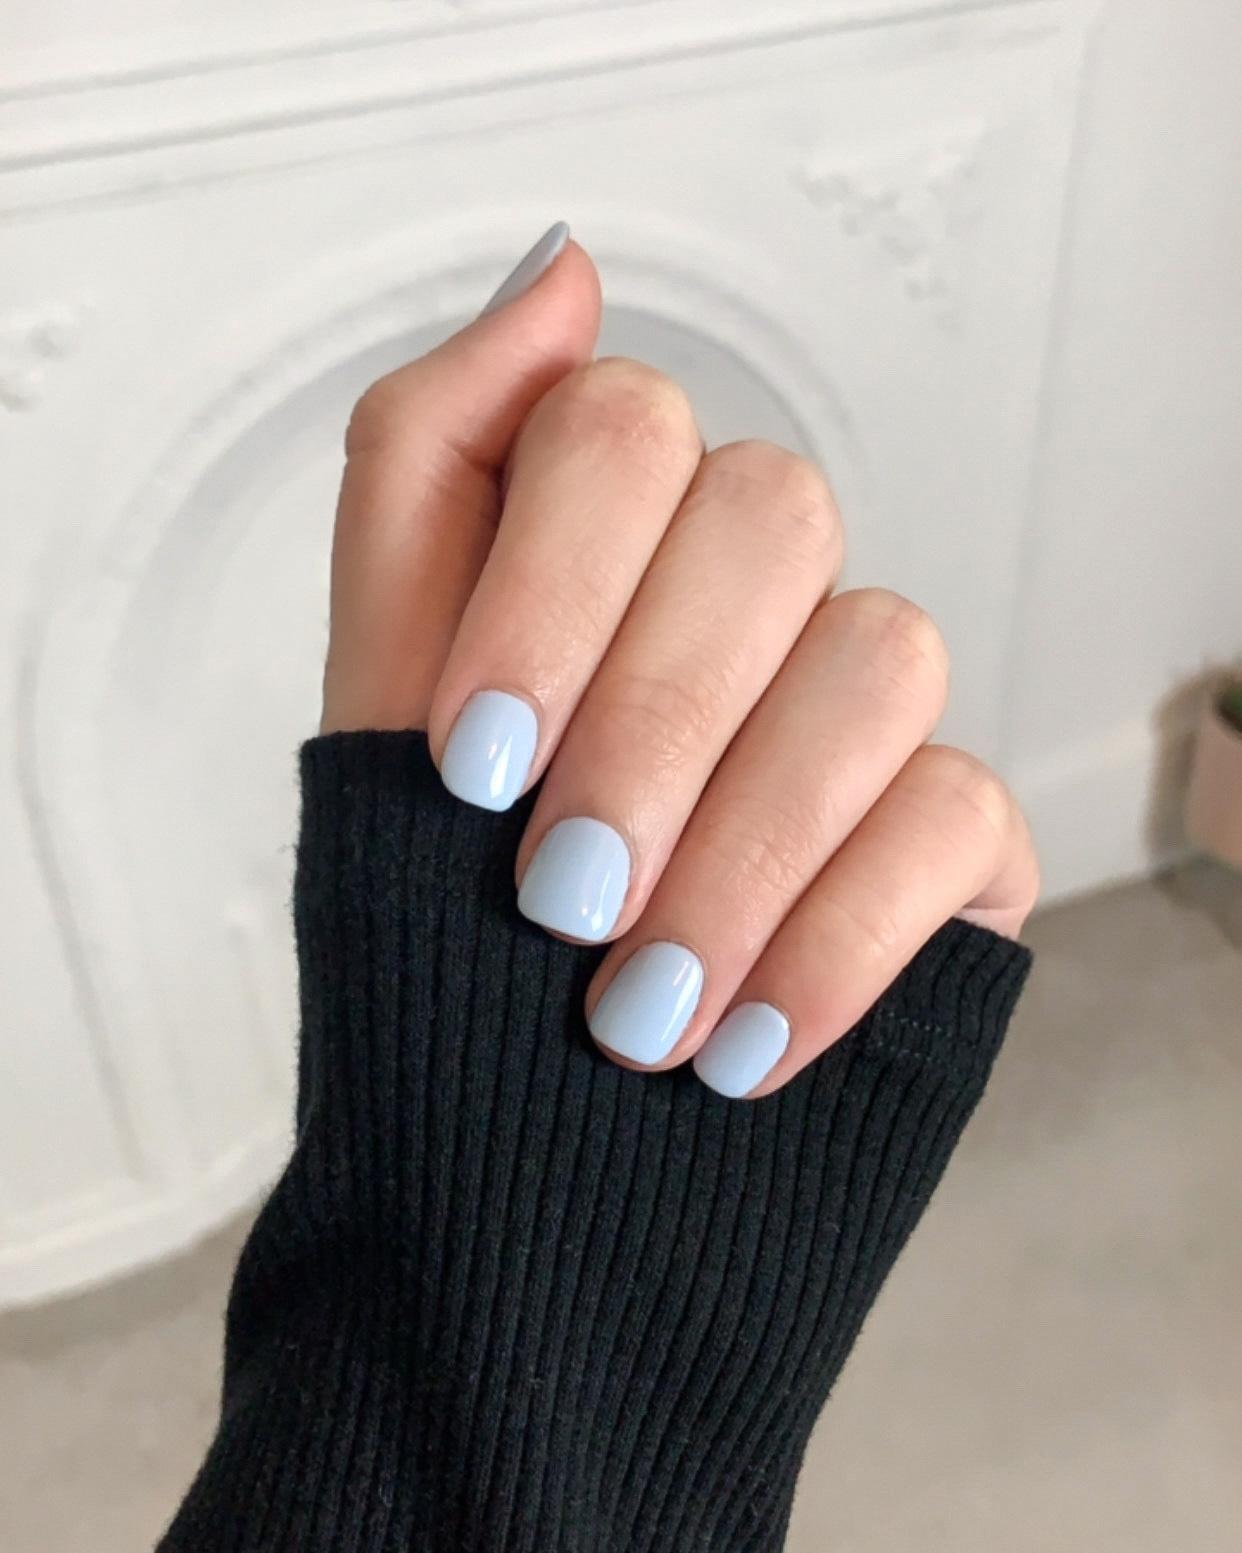 revarnish london gel manicure blog review